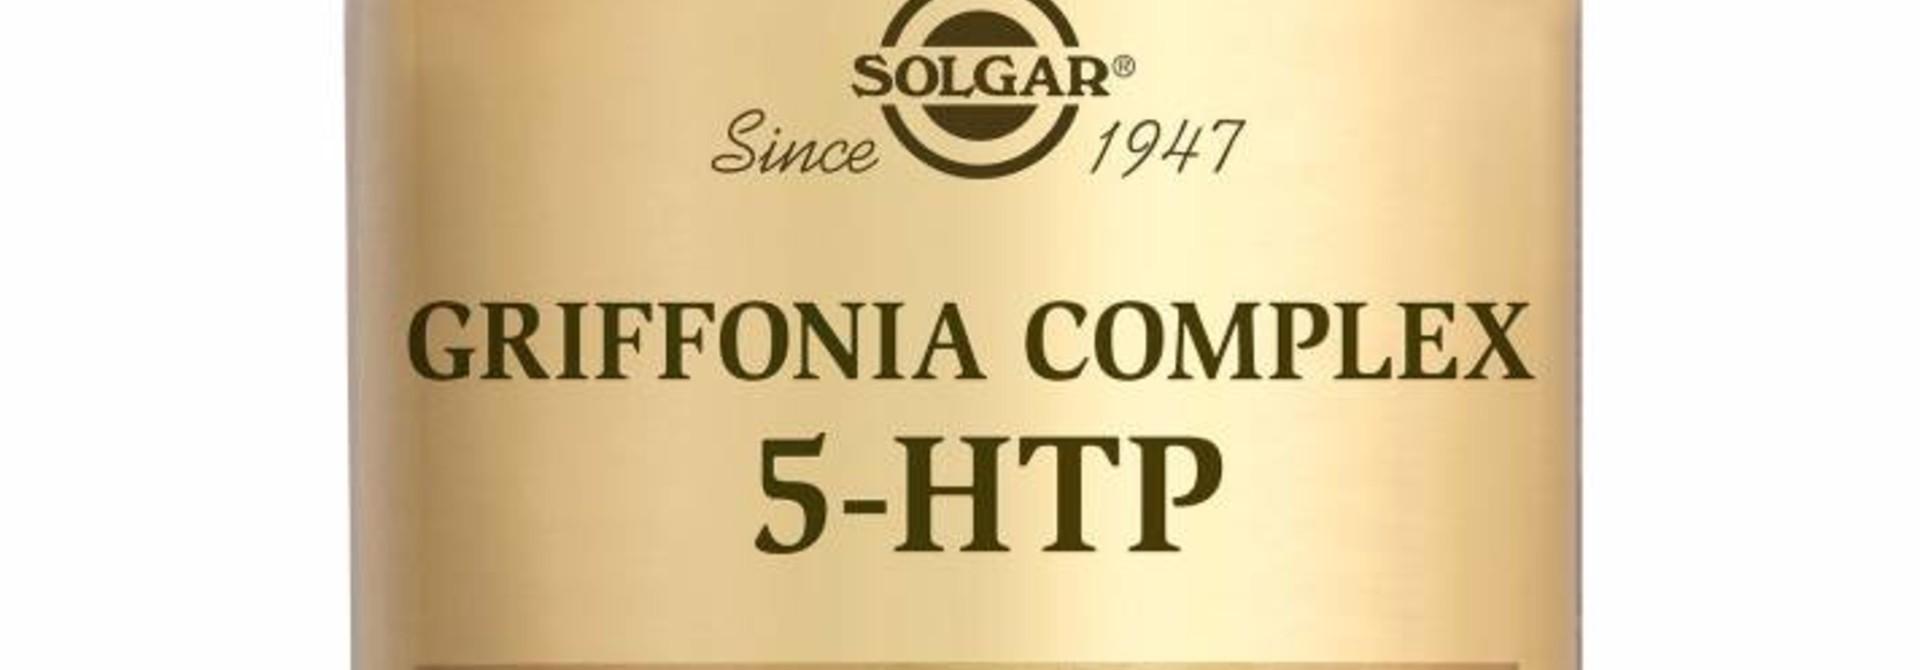 Griffonia Complex (5-HTP) 30 plantaardige capsules